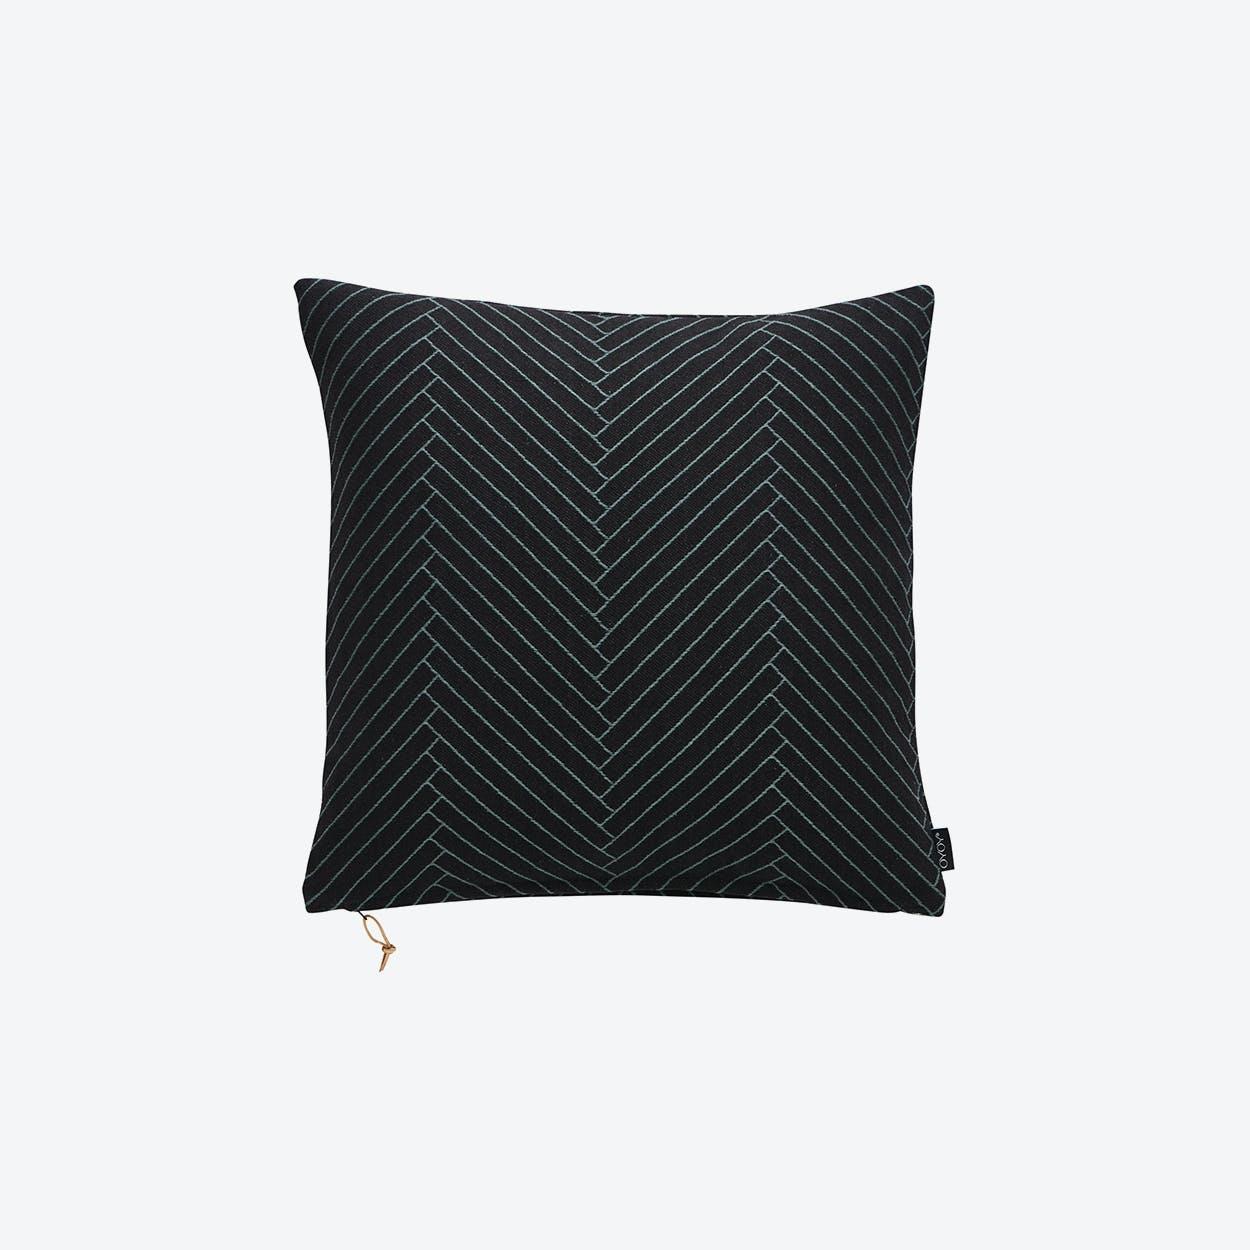 Fluffy Herringbone in Black